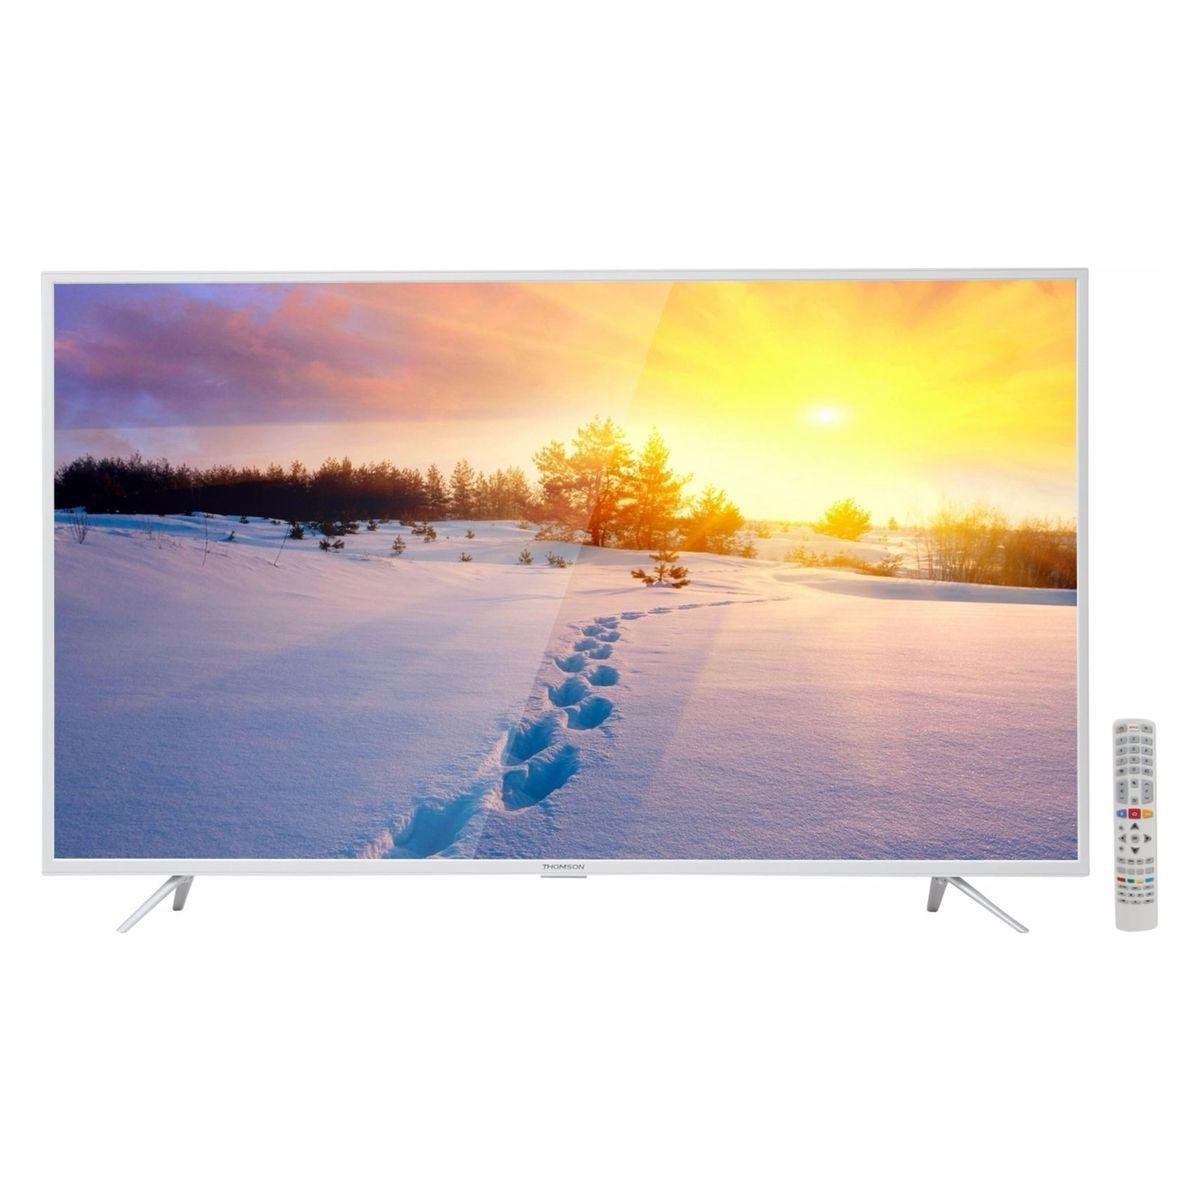 Телевизор Thomson 49UV6206W (4K / SmartTV / 49 дюймов / PPI 1200 / Wi-Fi / DVB-T2/S2/C/T/S)